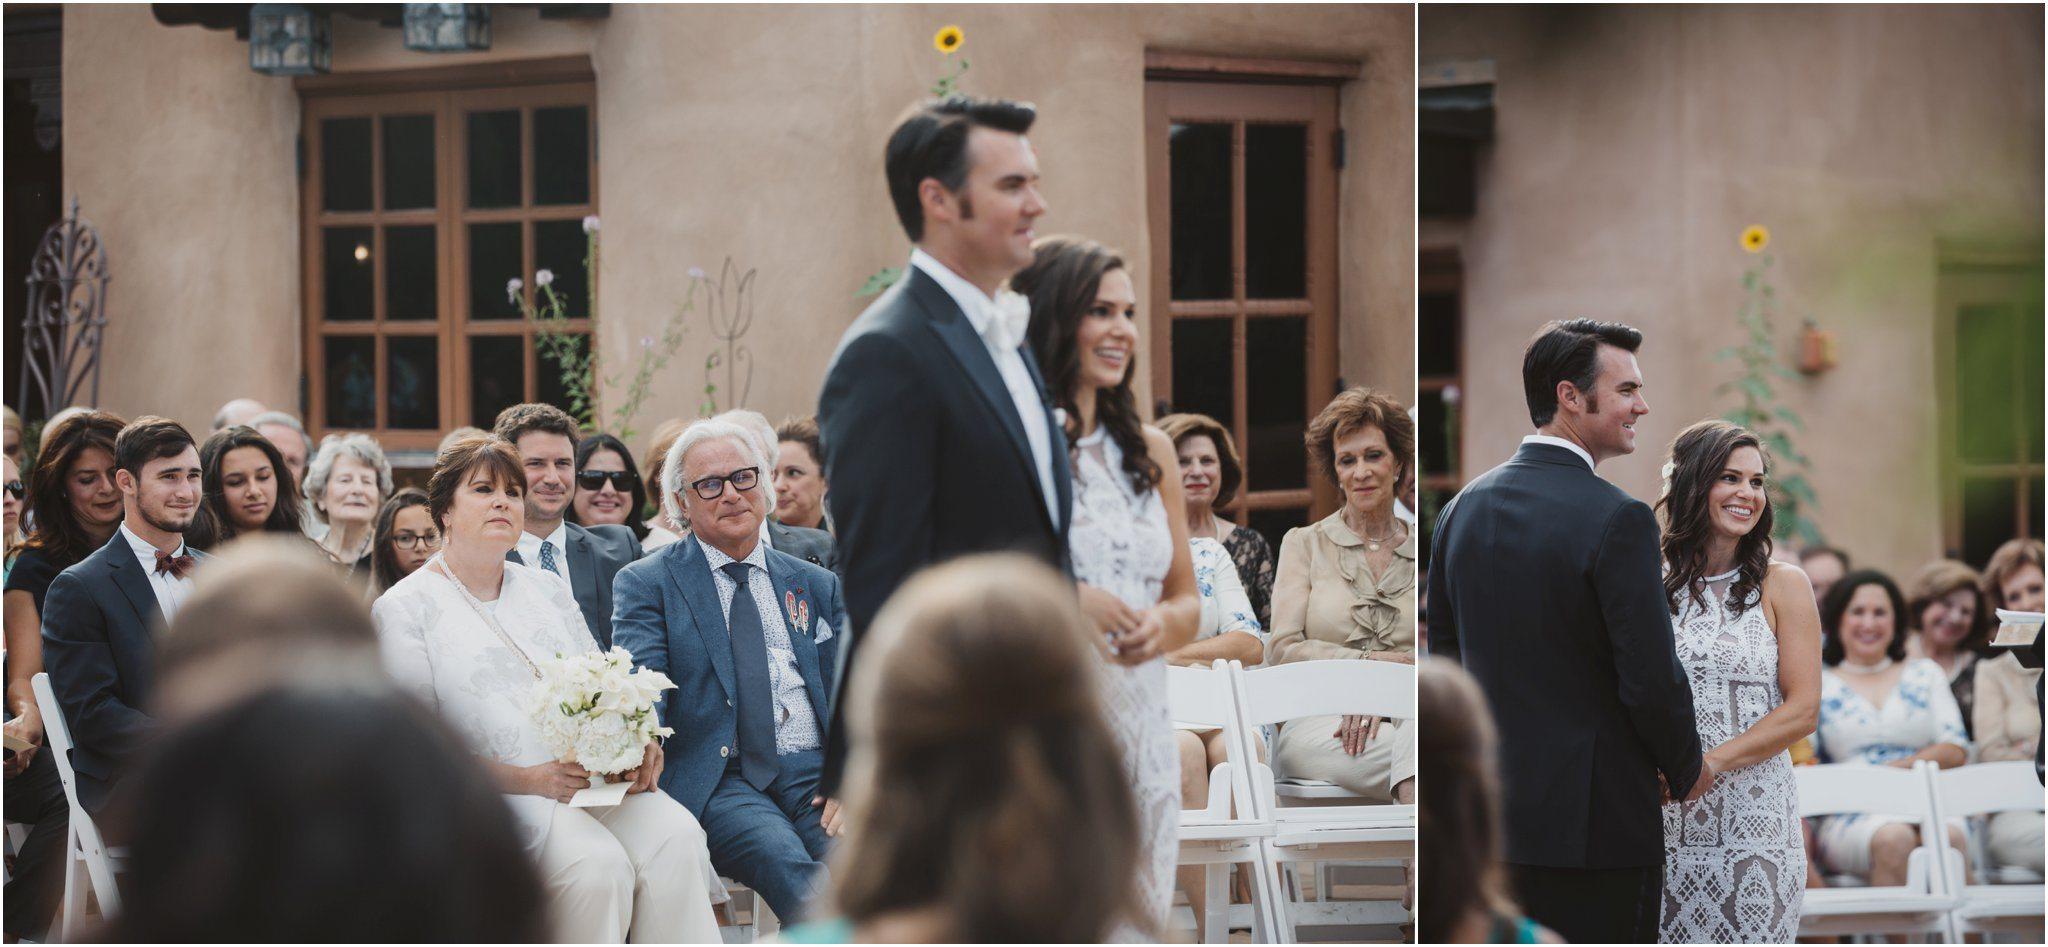 0052santa-fe-wedding-photographer_albuquerque-wedding-photographer_-southwest-wedding-photography_-blue-rose-studio